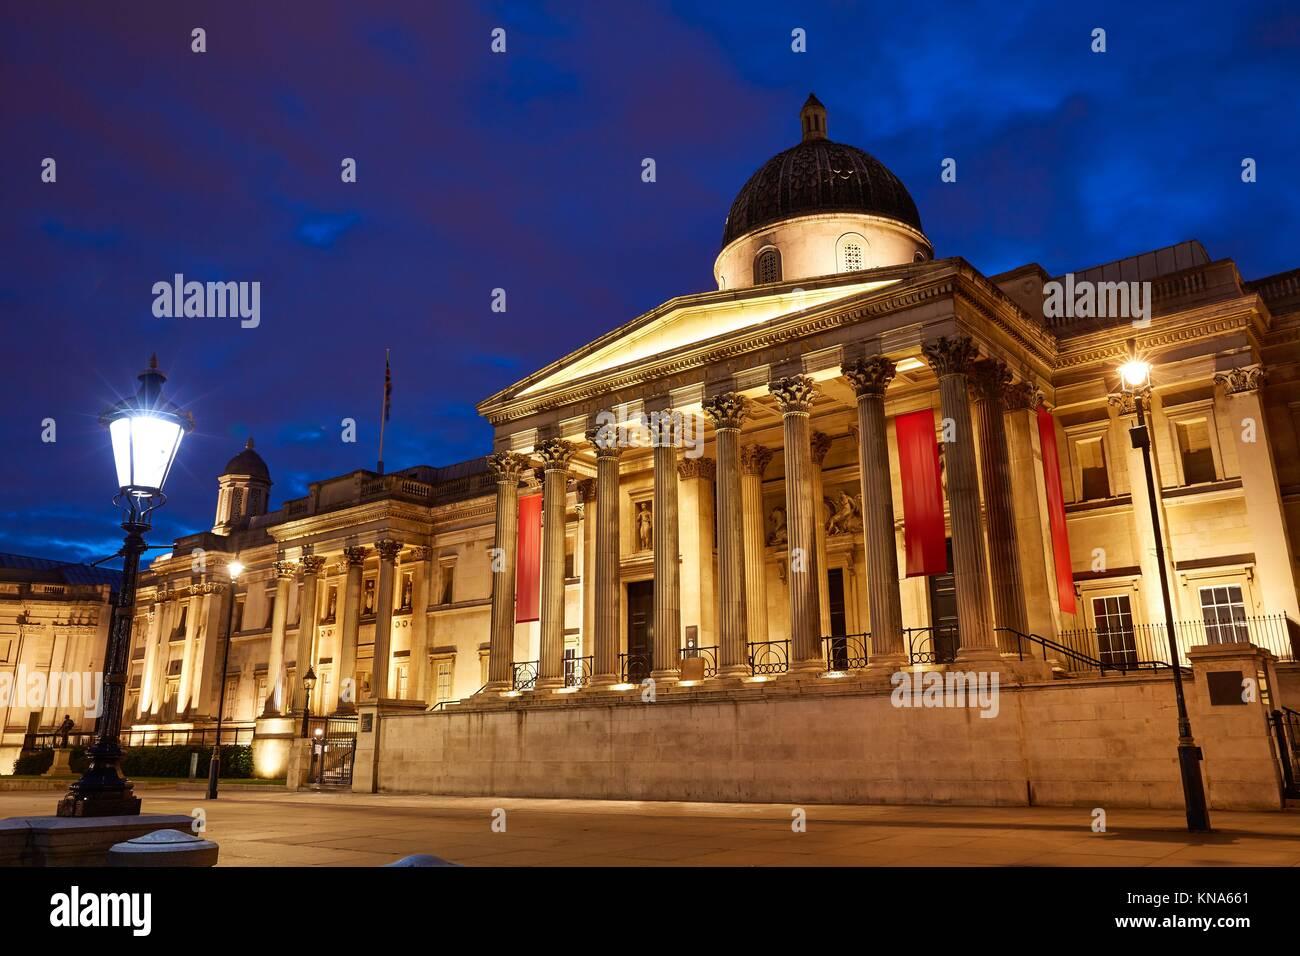 Londra Galelery nazionale in Trafalgar Square al tramonto in Inghilterra. Immagini Stock